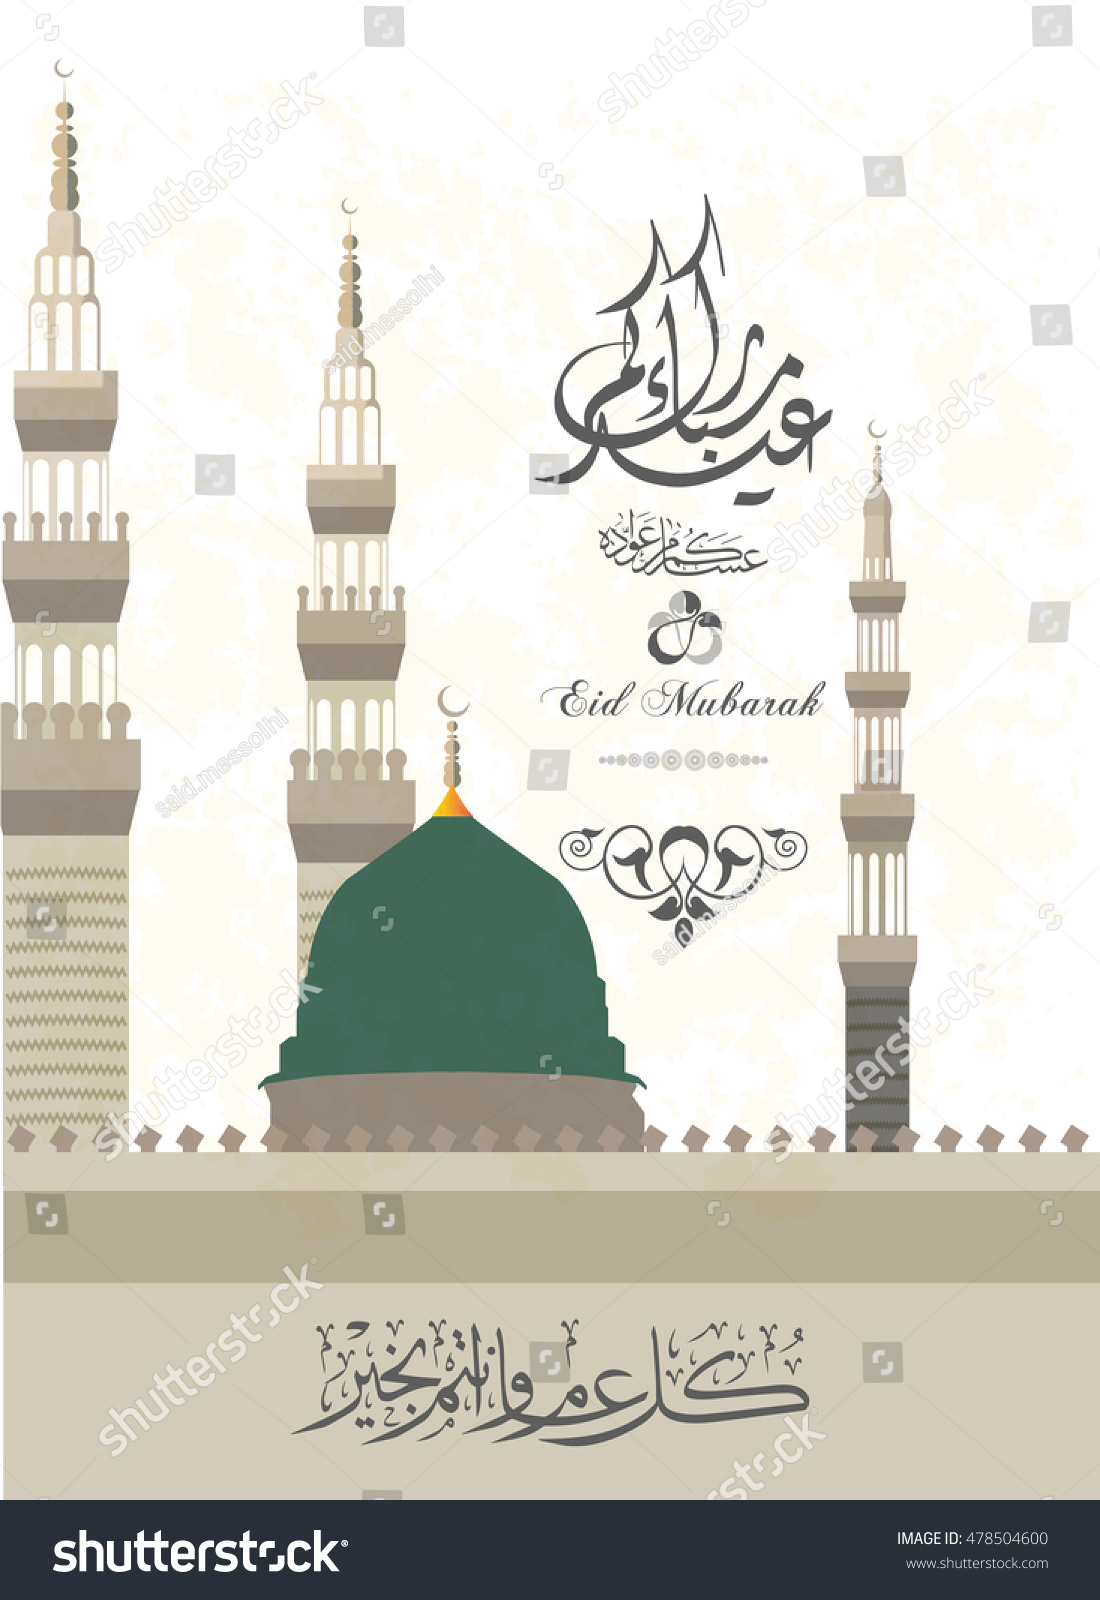 Simple Eid Il Eid Al-Fitr Greeting - stock-vector-greeting-card-of-eid-al-fitr-and-eid-ul-adha-saeed-mubarak-with-arabic-calligraphy-478504600  Pic_941871 .jpg